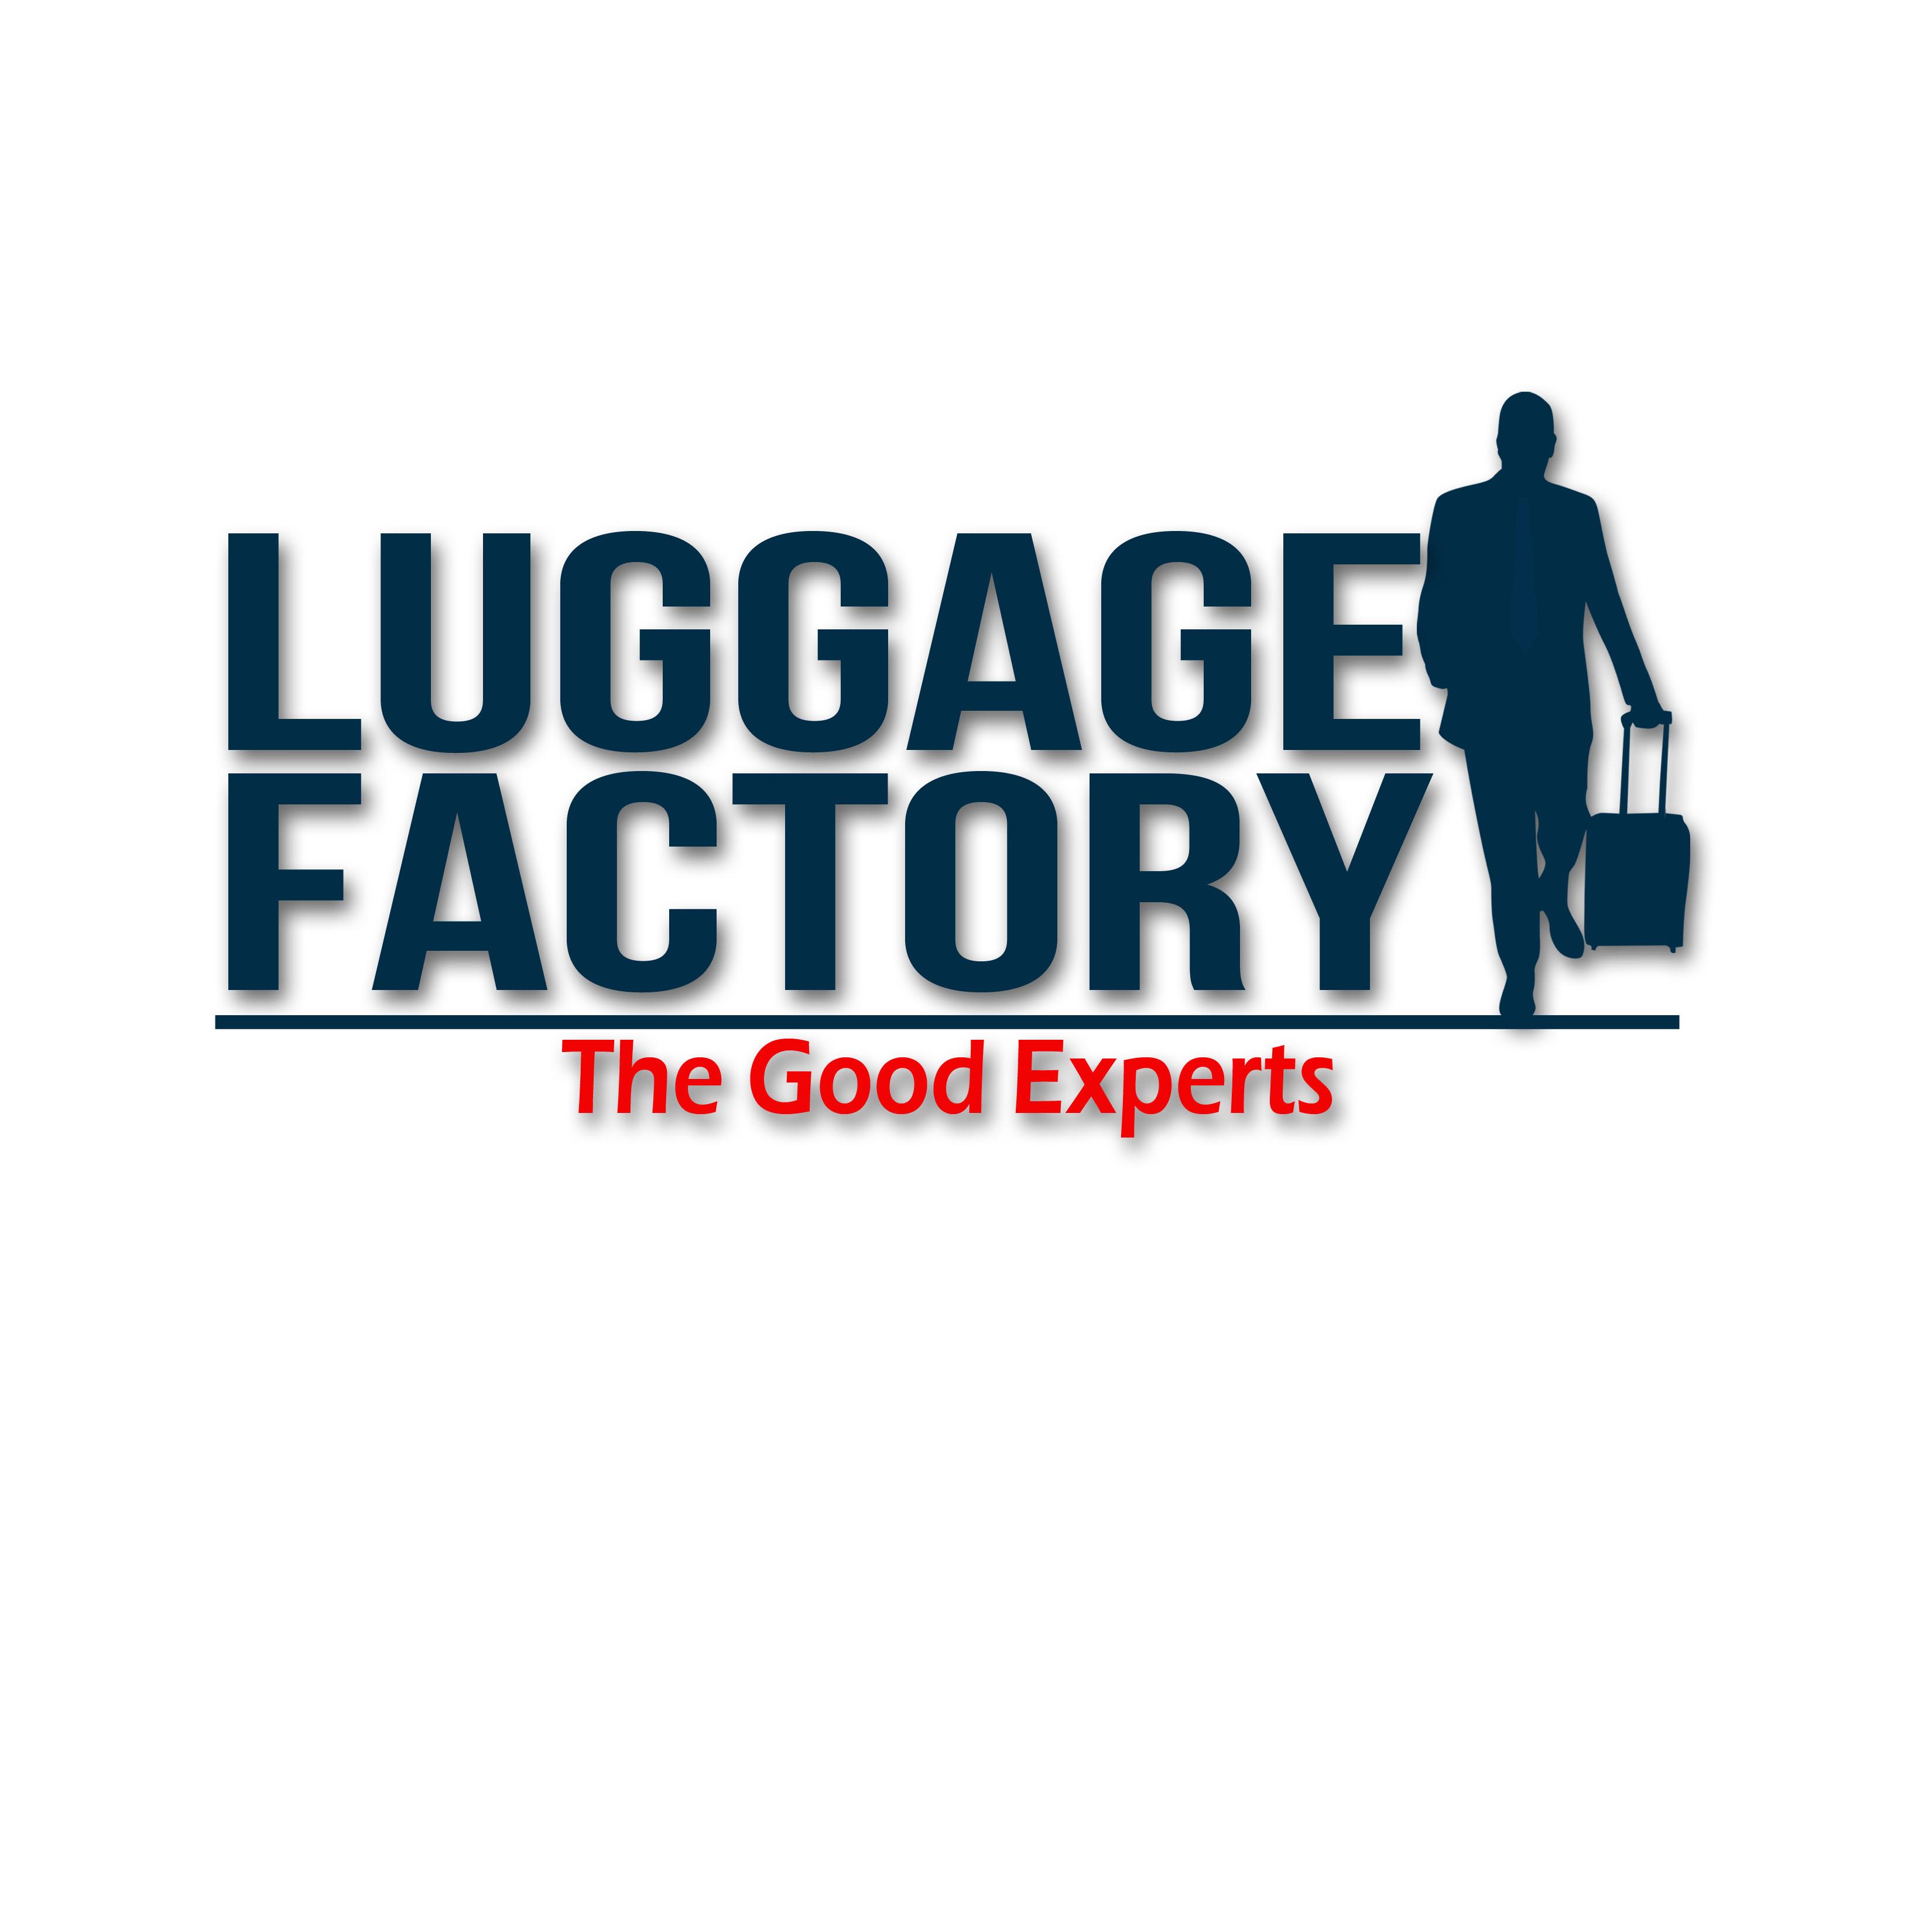 Logo Design by Allan Esclamado - Entry No. 226 in the Logo Design Contest Creative Logo Design for Luggage Factory.